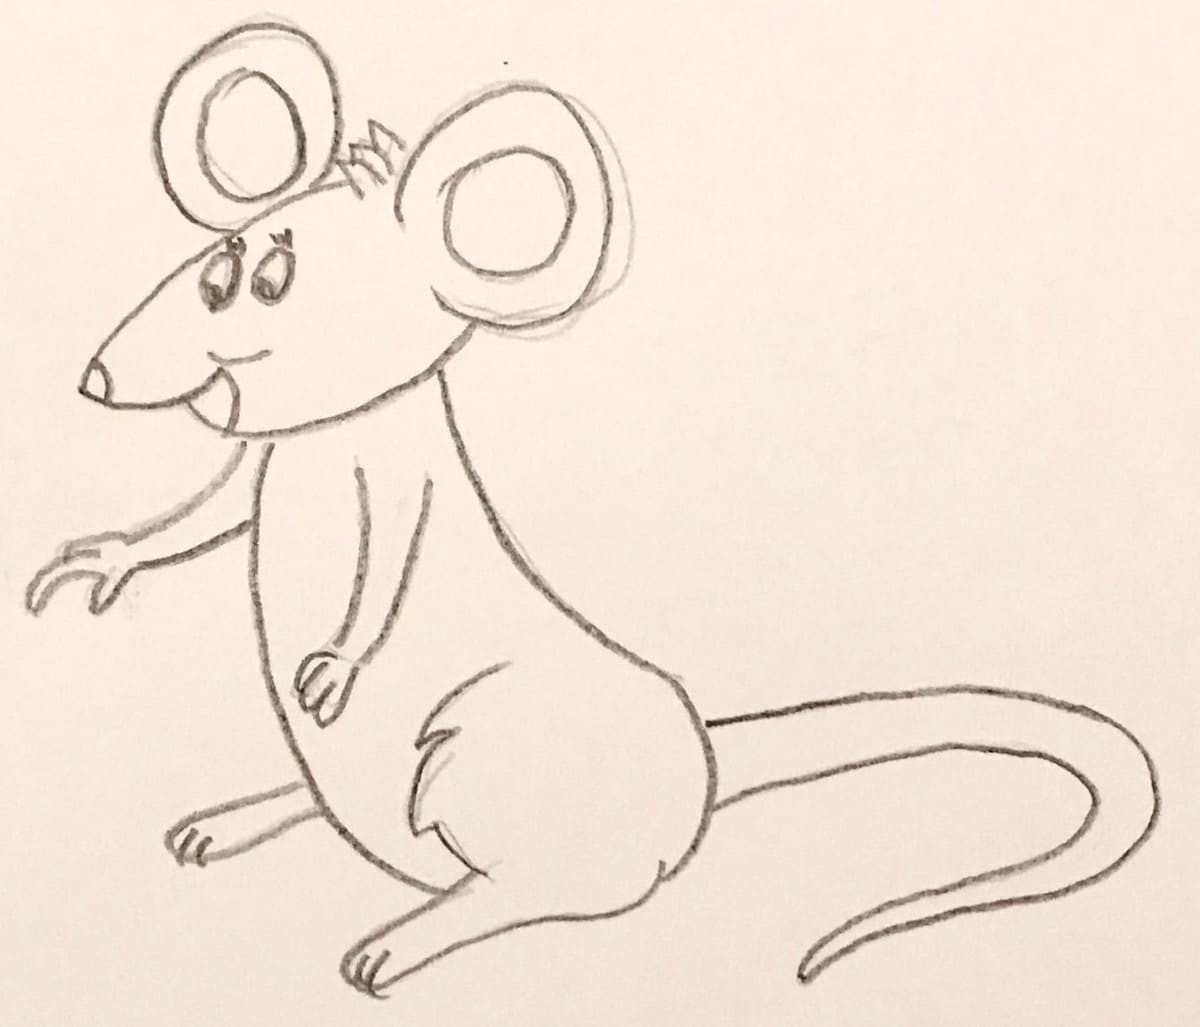 Right-clicking Mouse. Heinz Tschabitscher